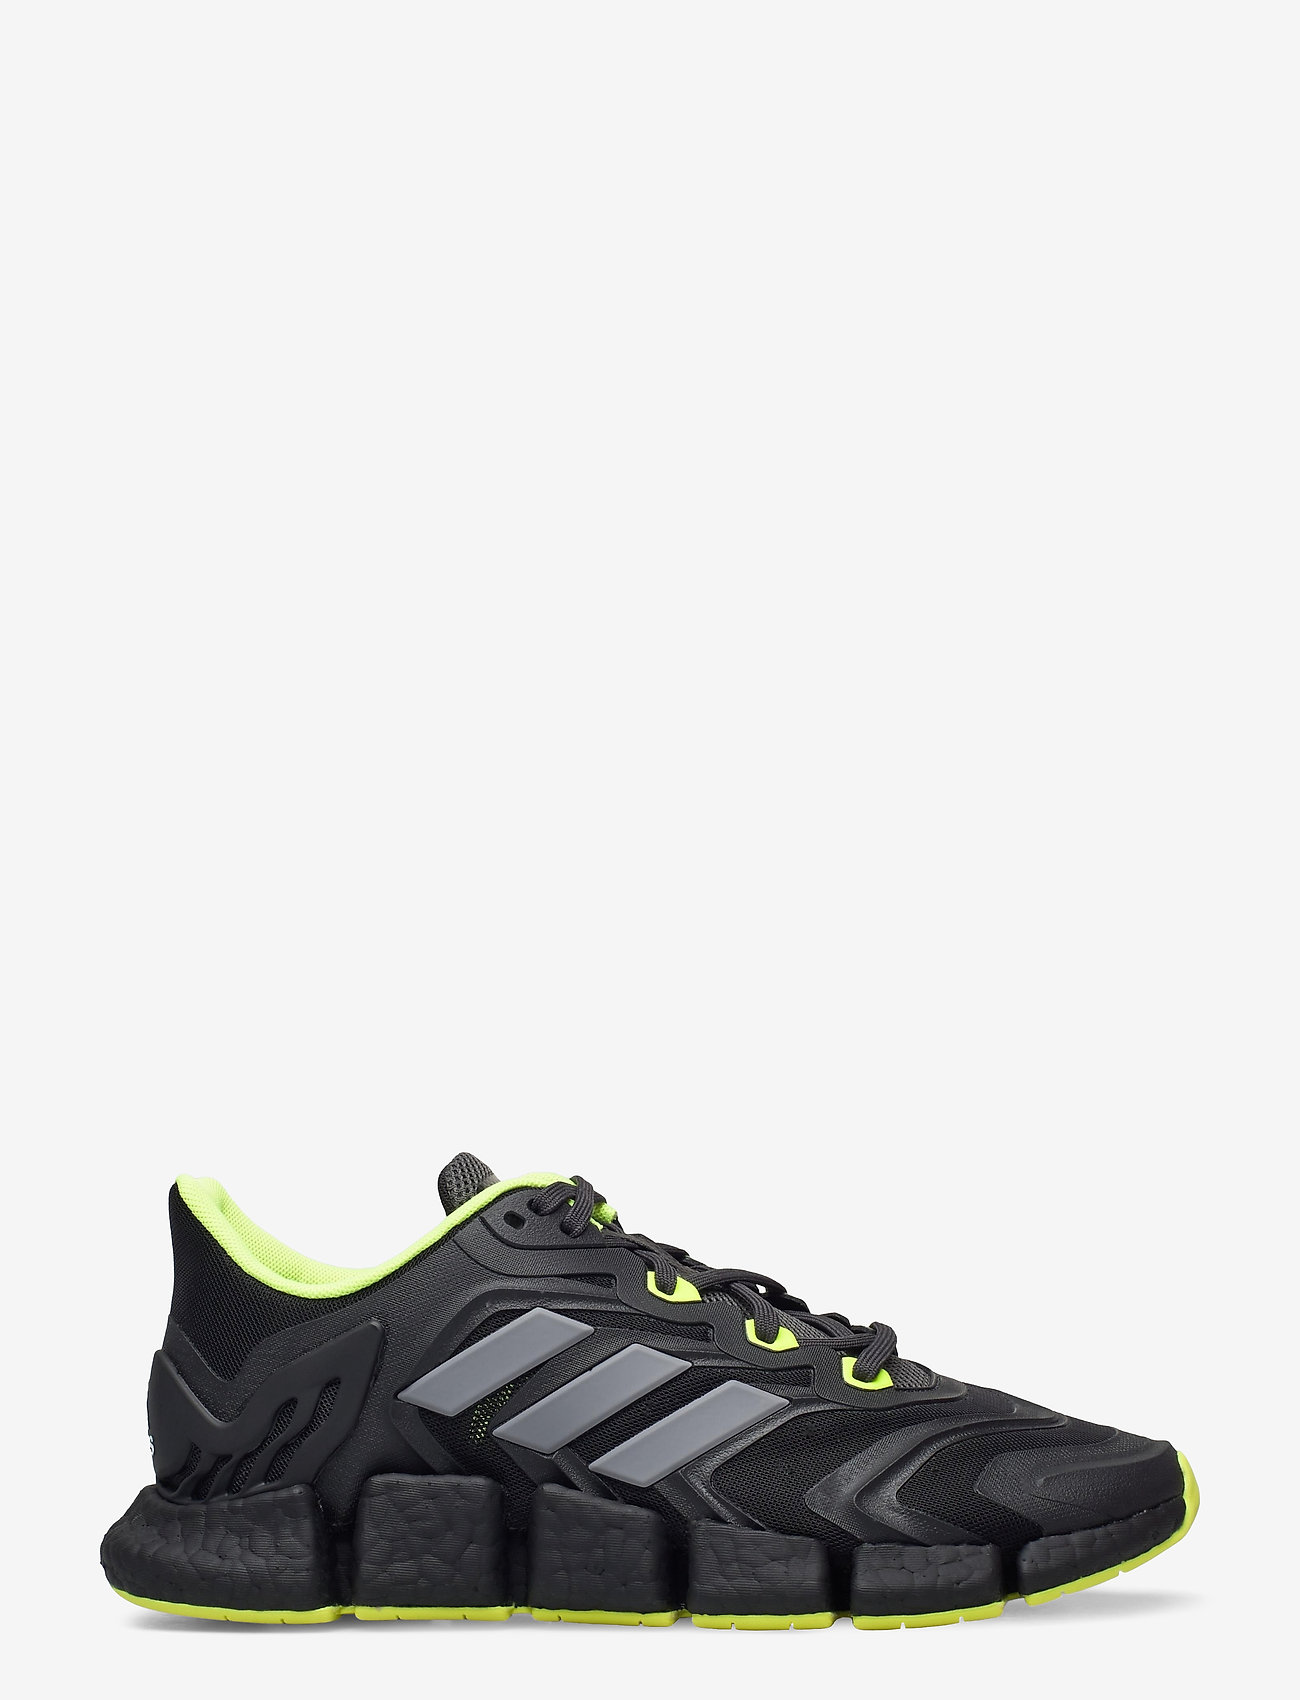 adidas Performance - CLIMACOOL VENTO - löbesko - cblack/grefou/carbon - 1